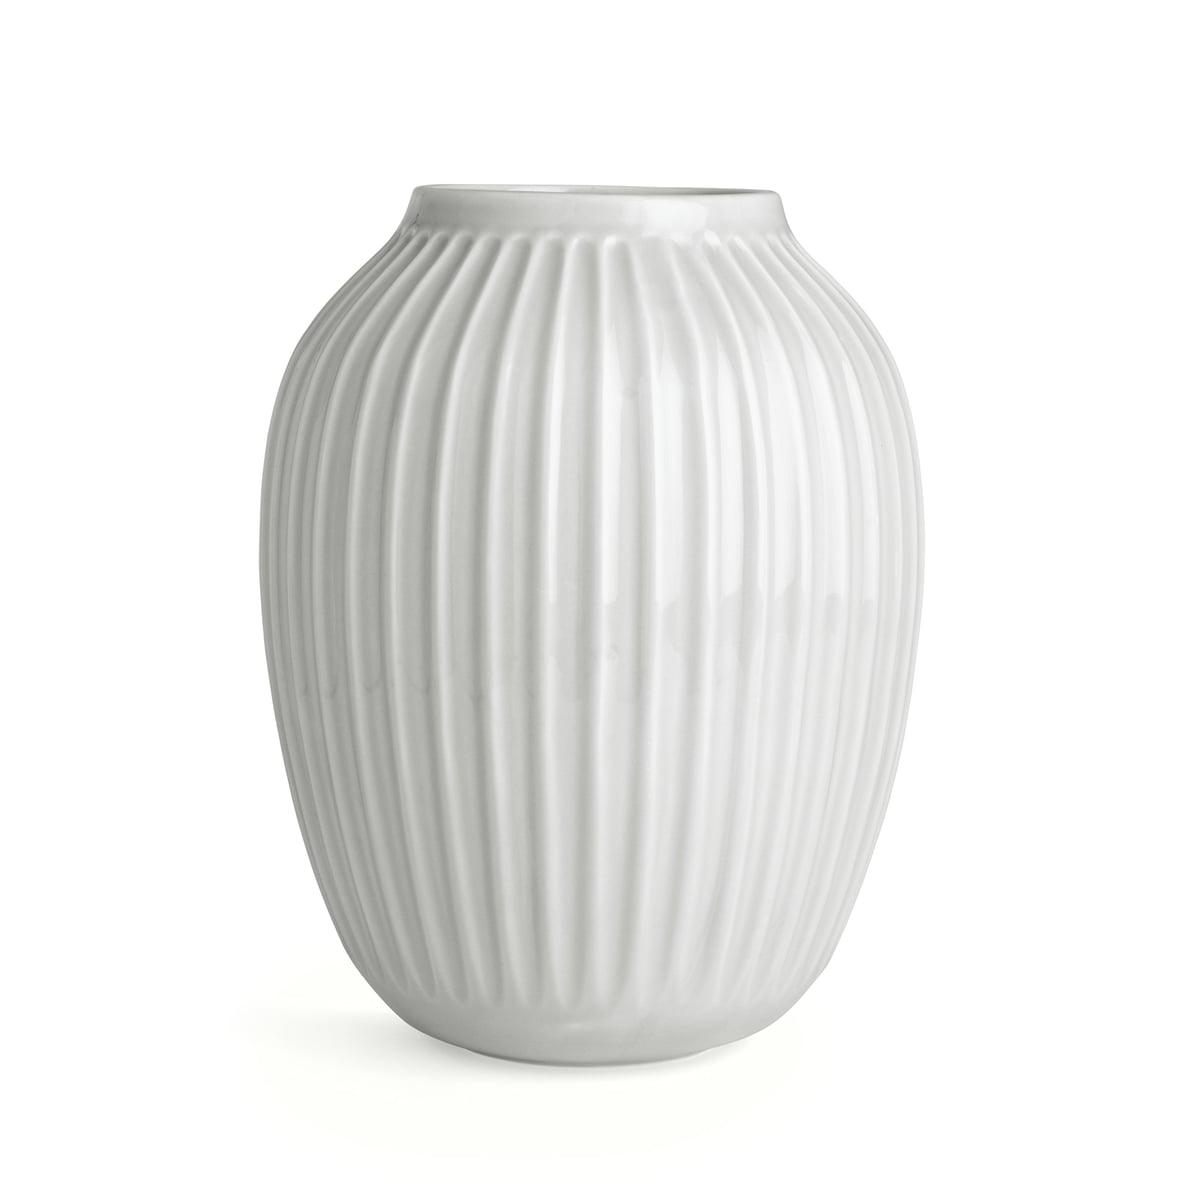 Kaehler design hammershoi vase h 25 cm weiss frei